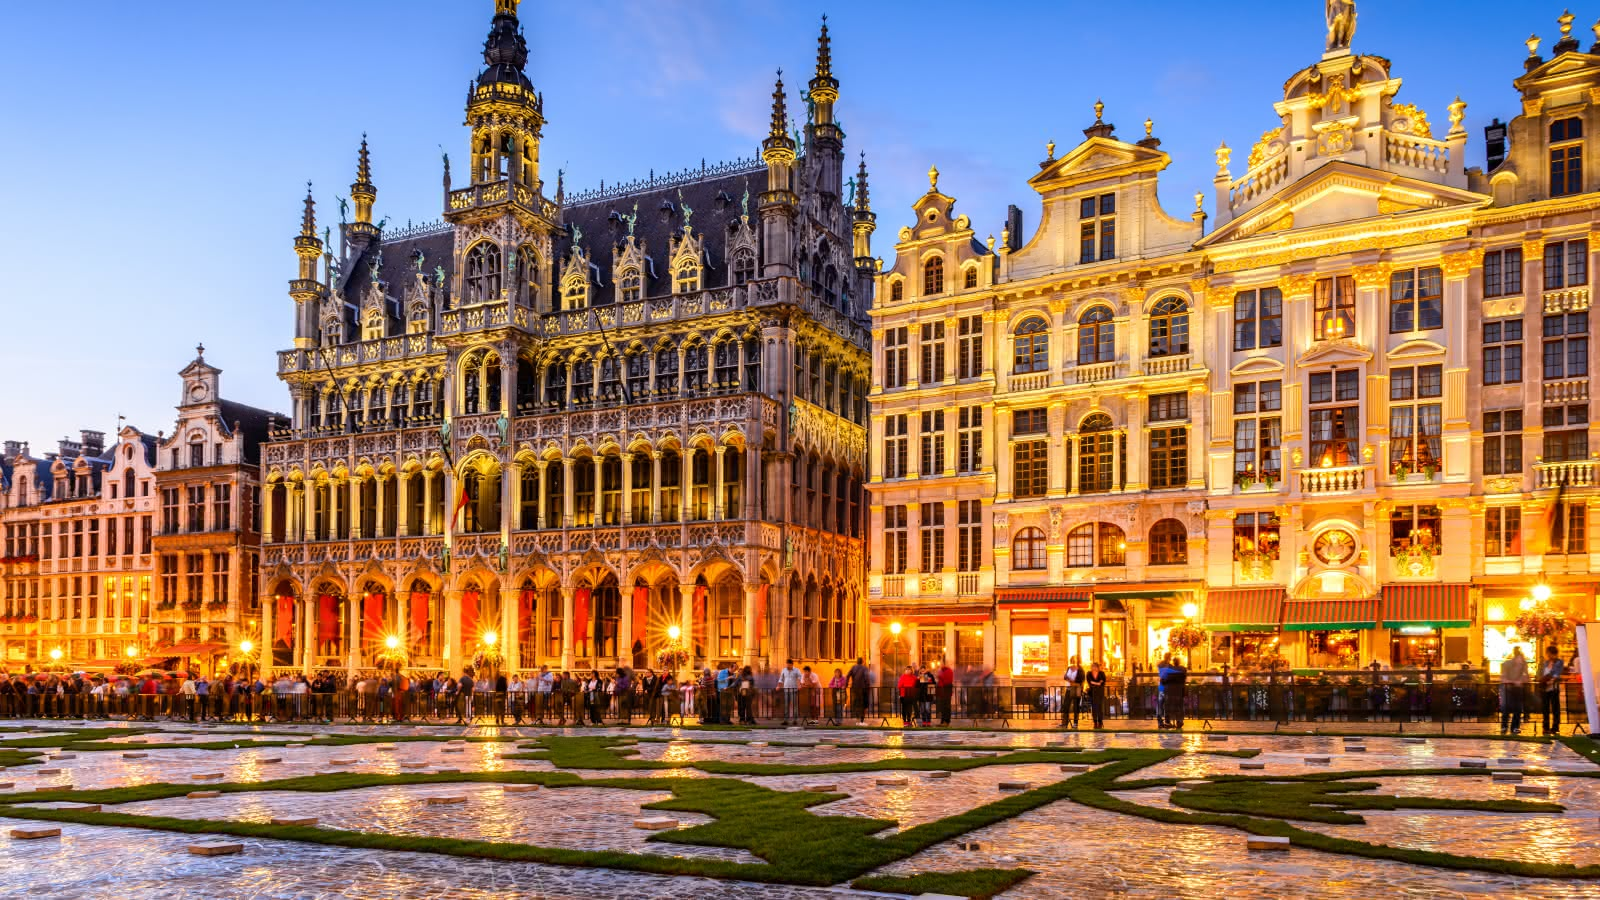 SANDEMANs Brussels Walking Tours